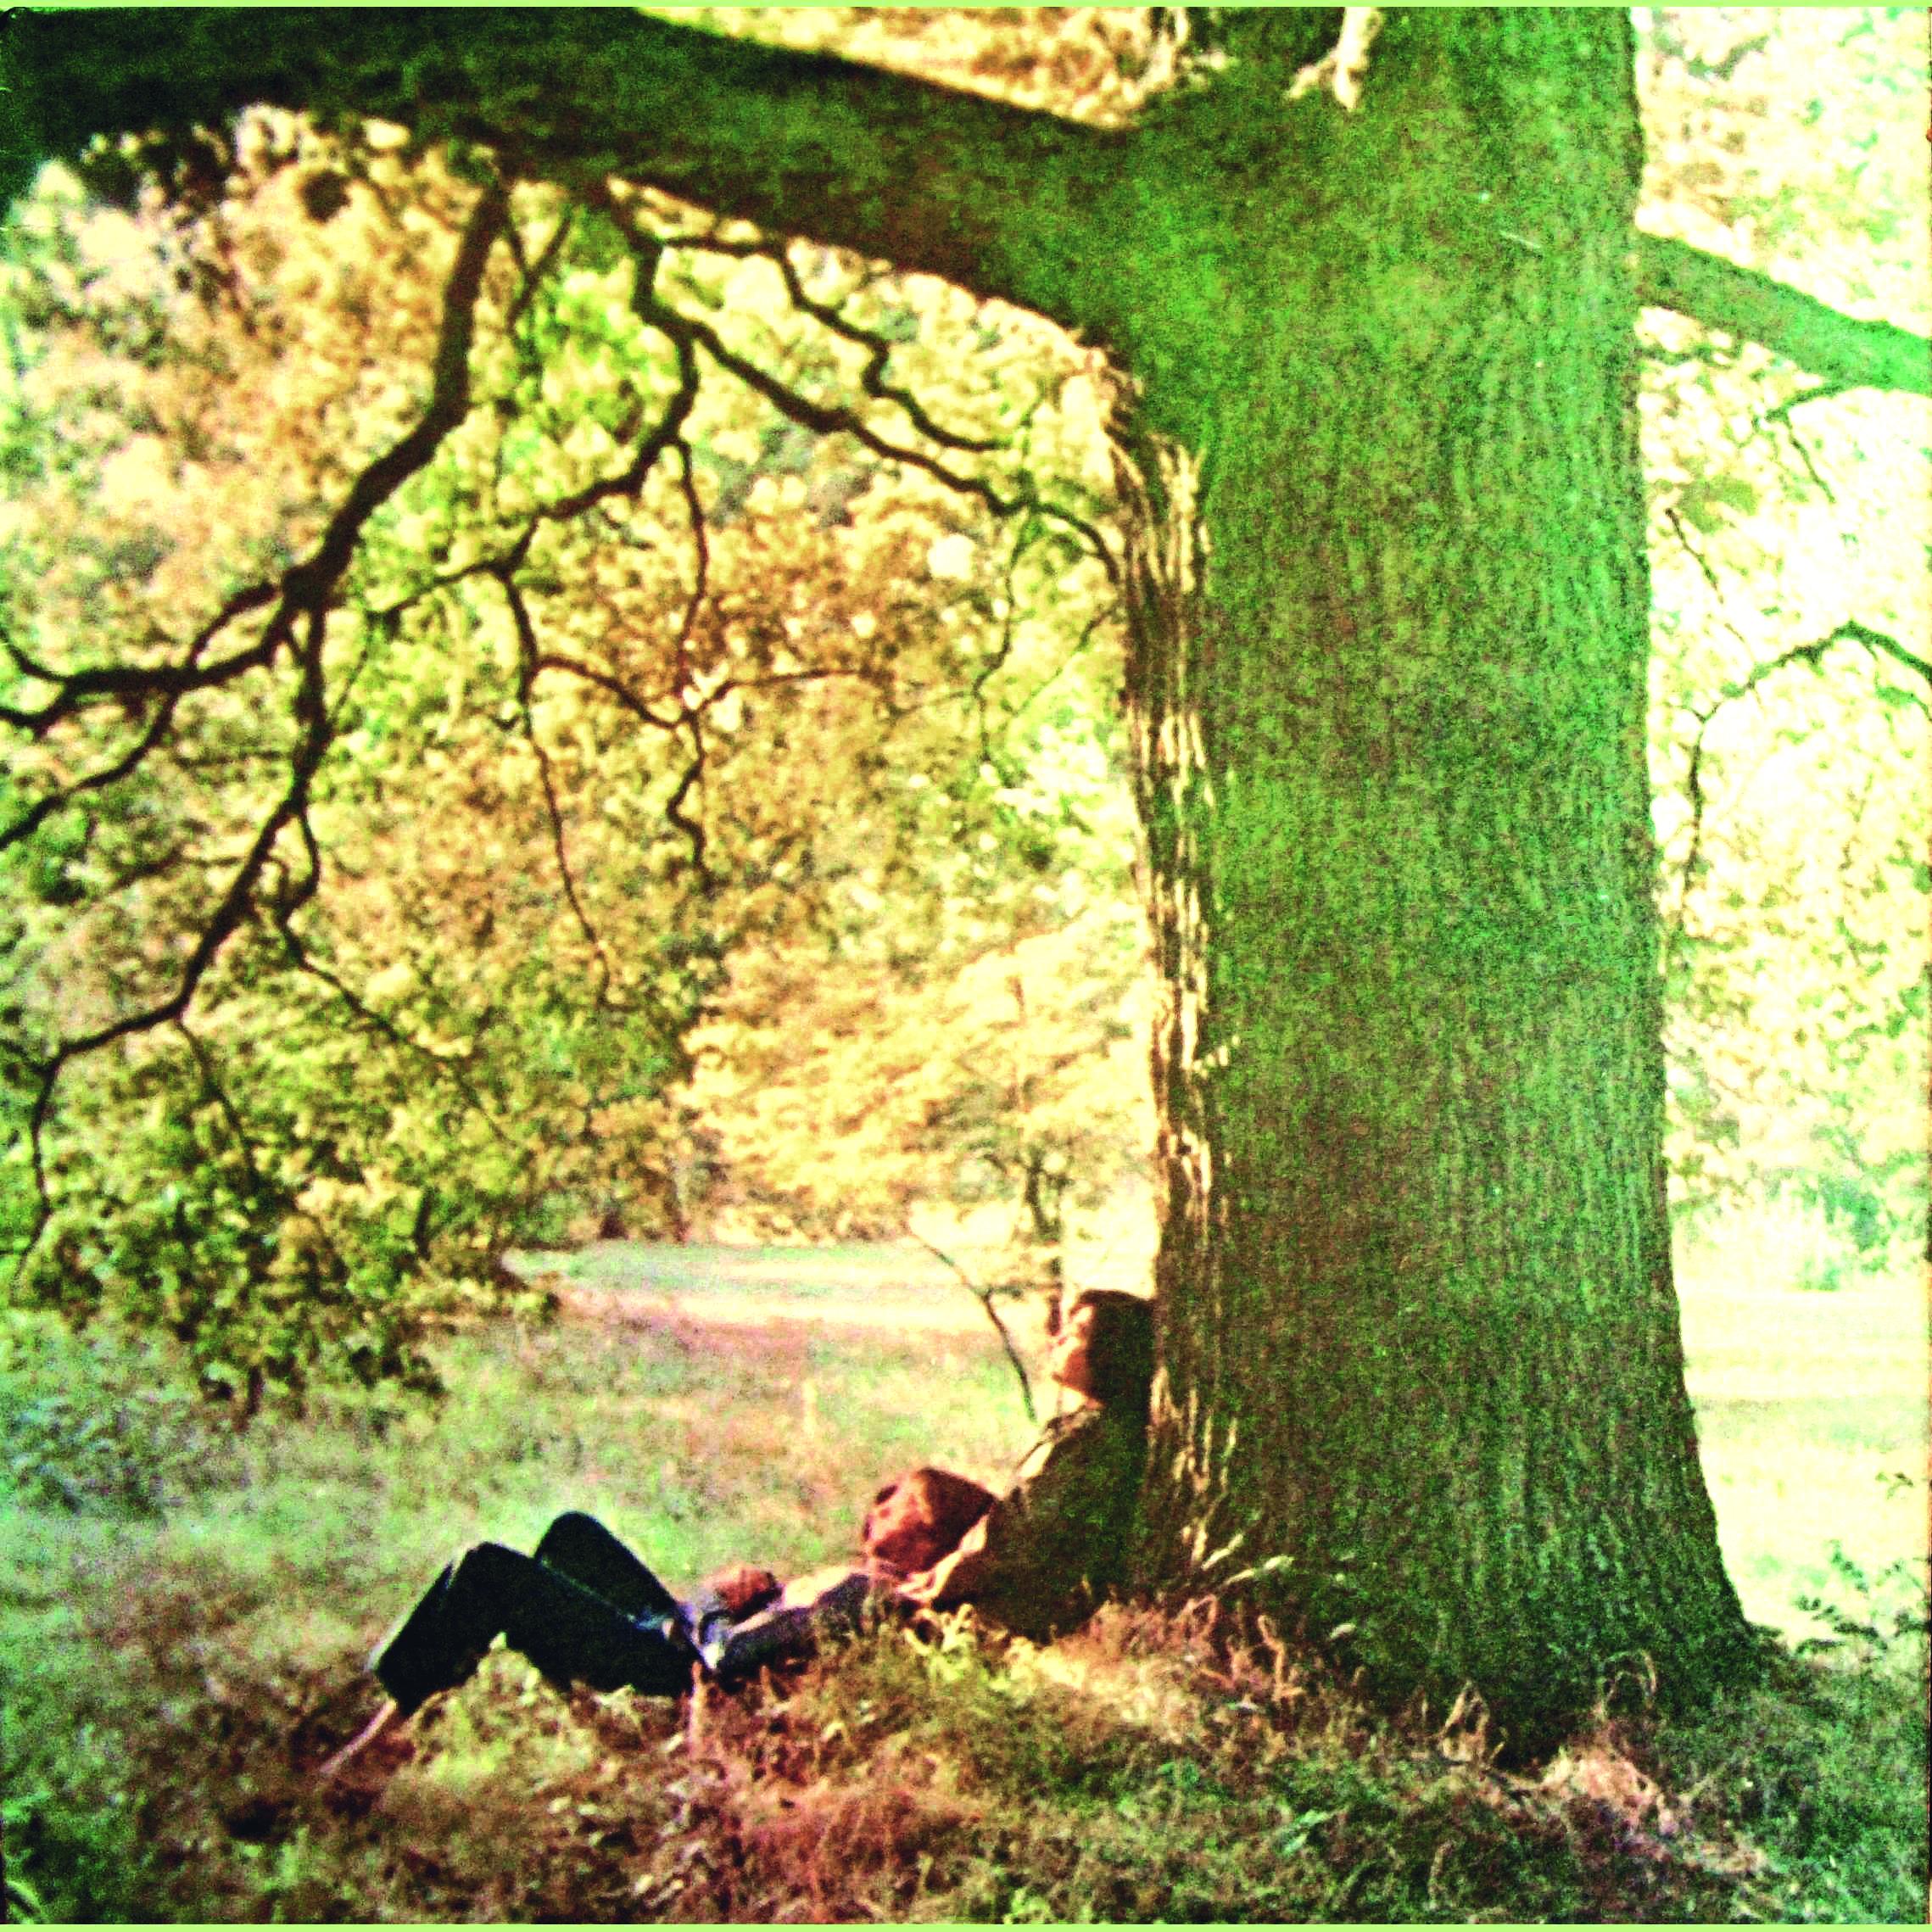 John-Lennon-Plastic-Ono-Band-cover